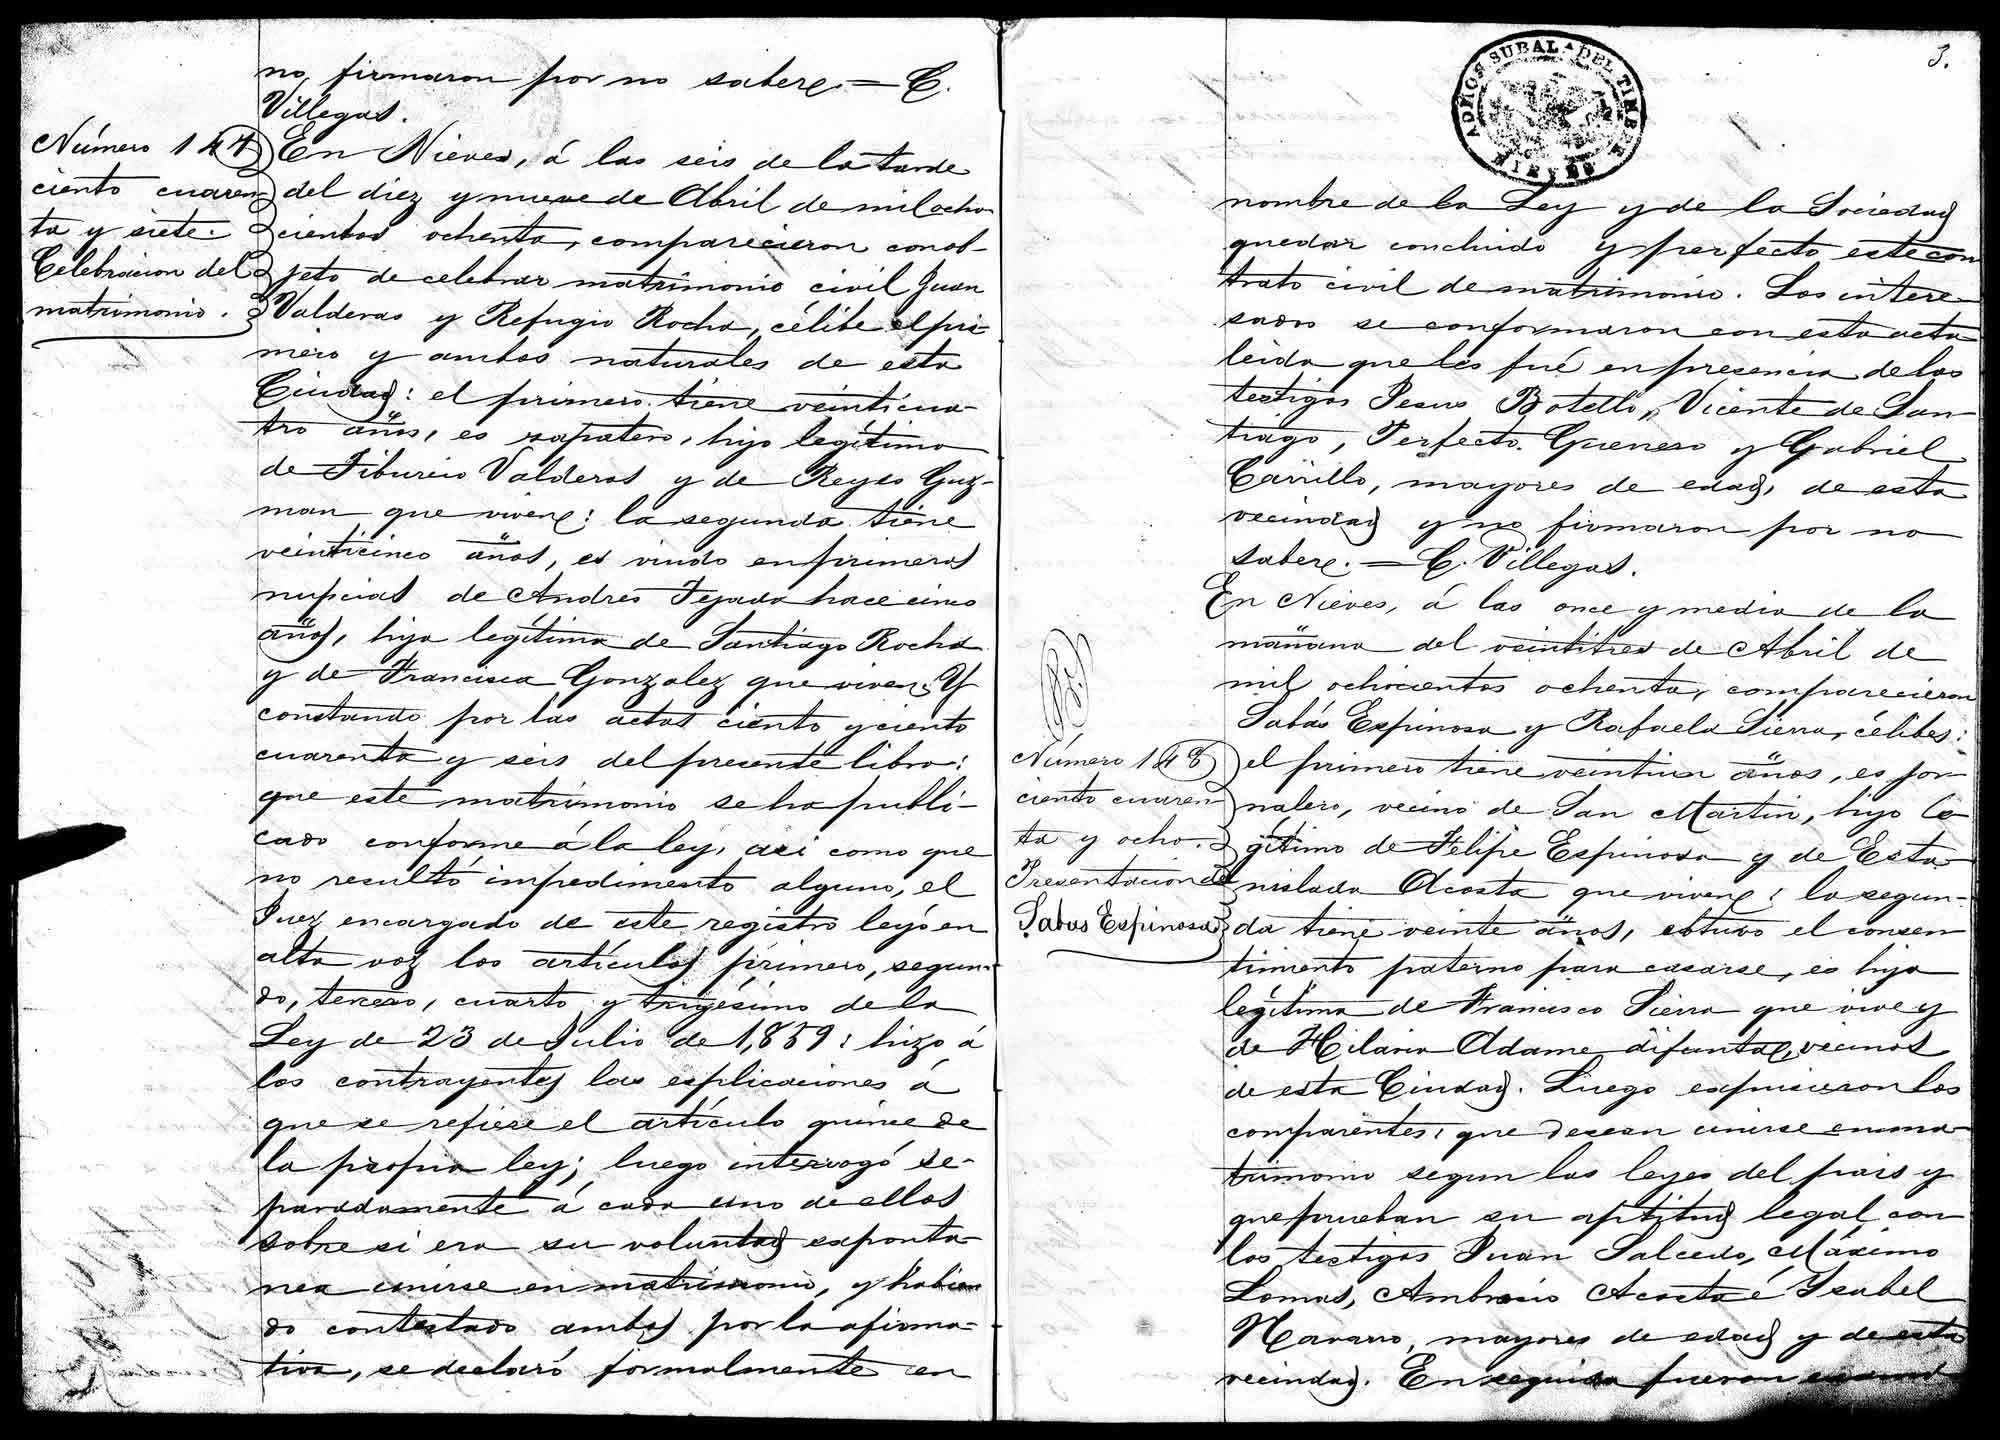 Nieves marriage record for Juan Balderas and Refugio Rocha, #147